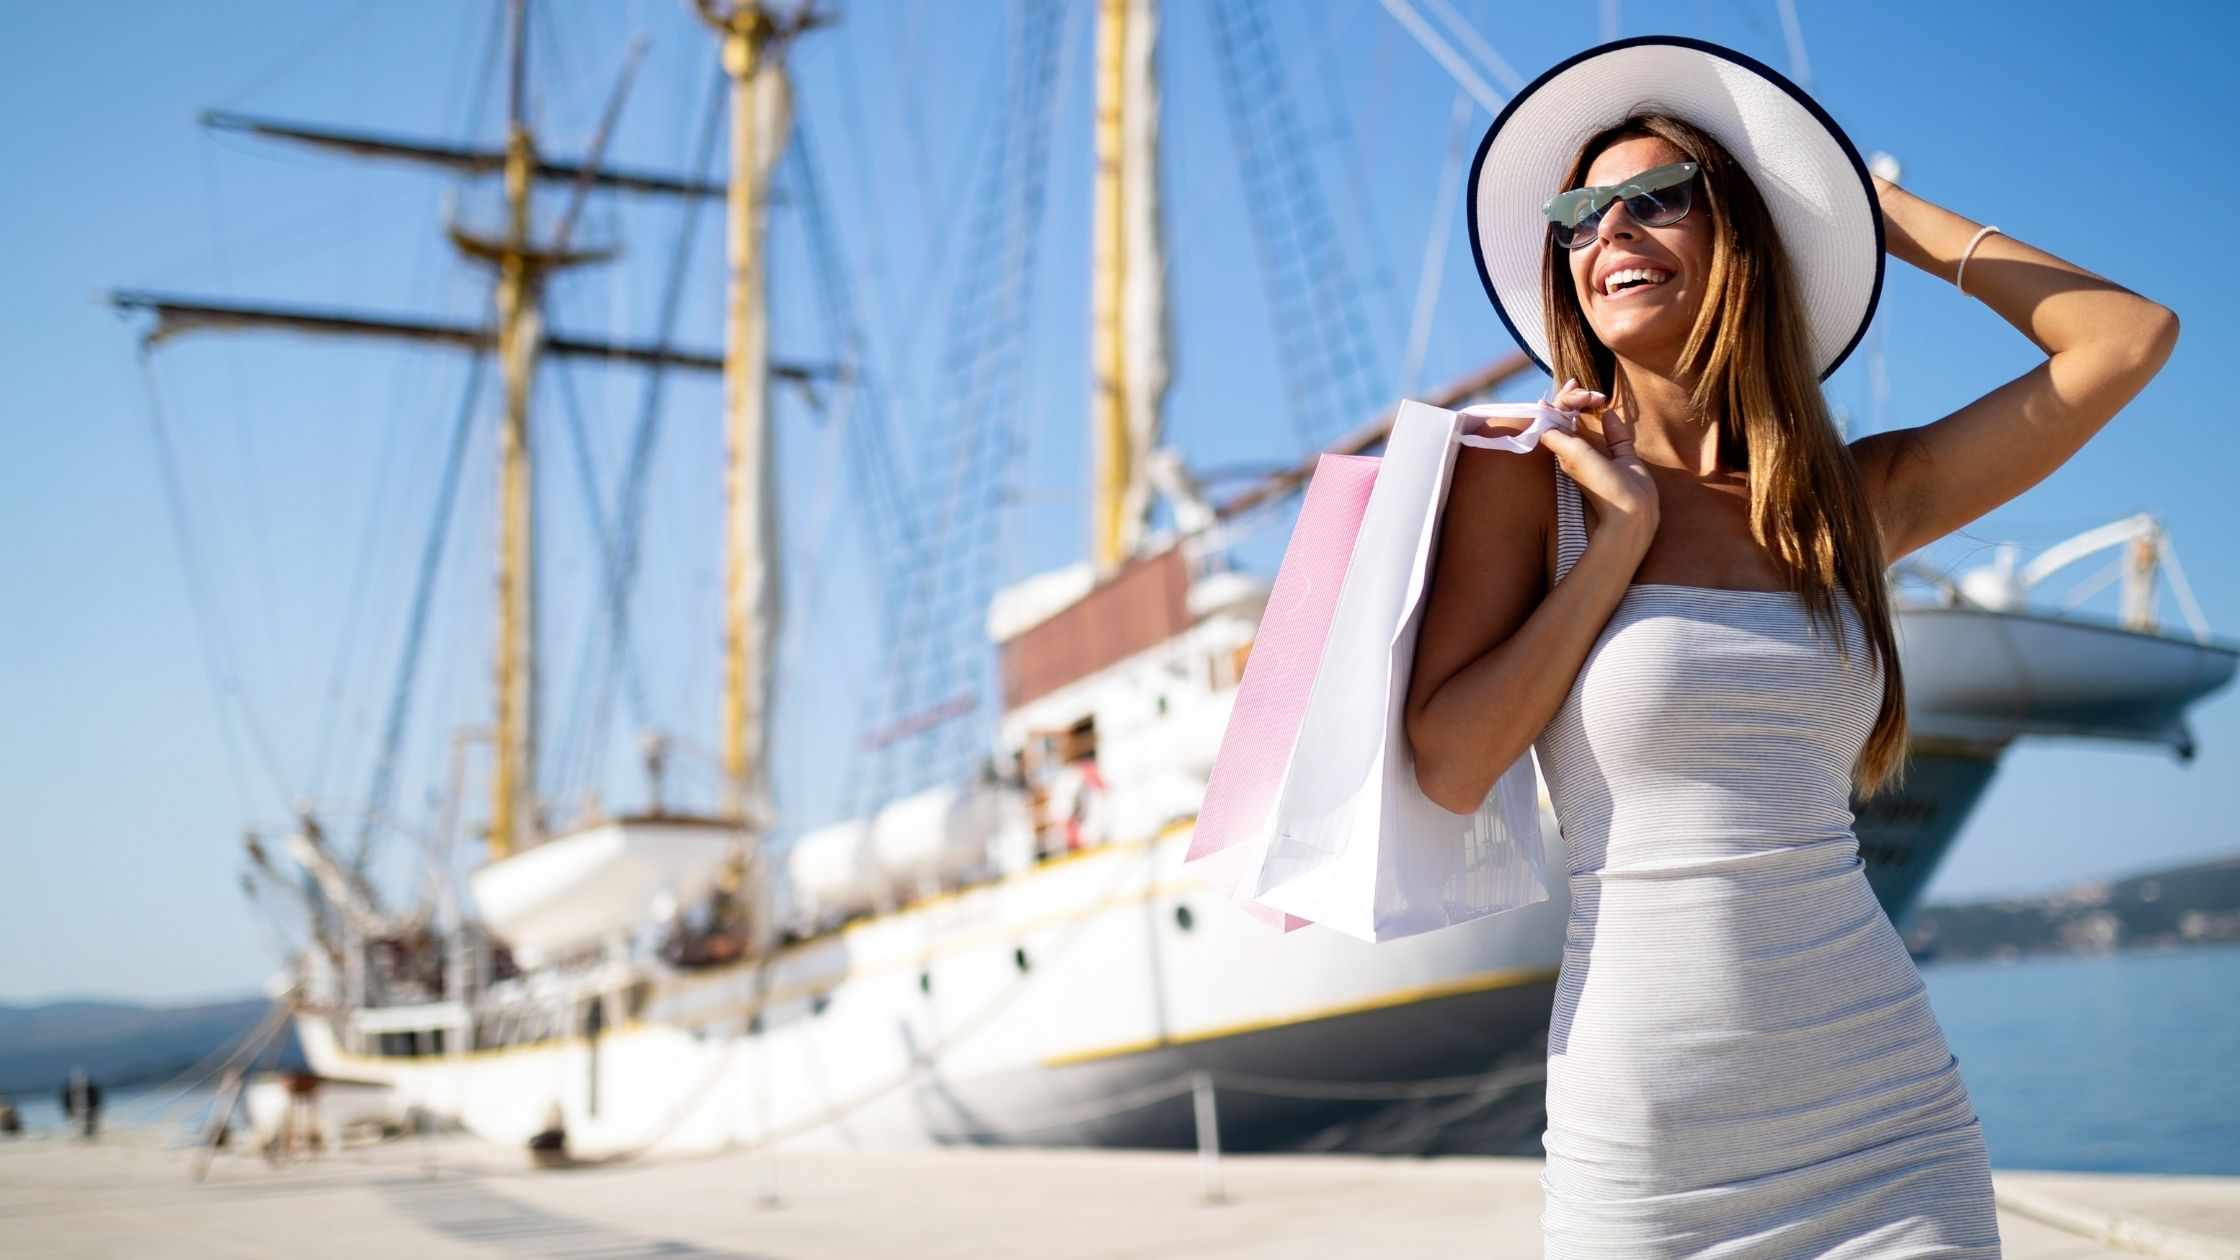 a woman living a lavish lifestyle